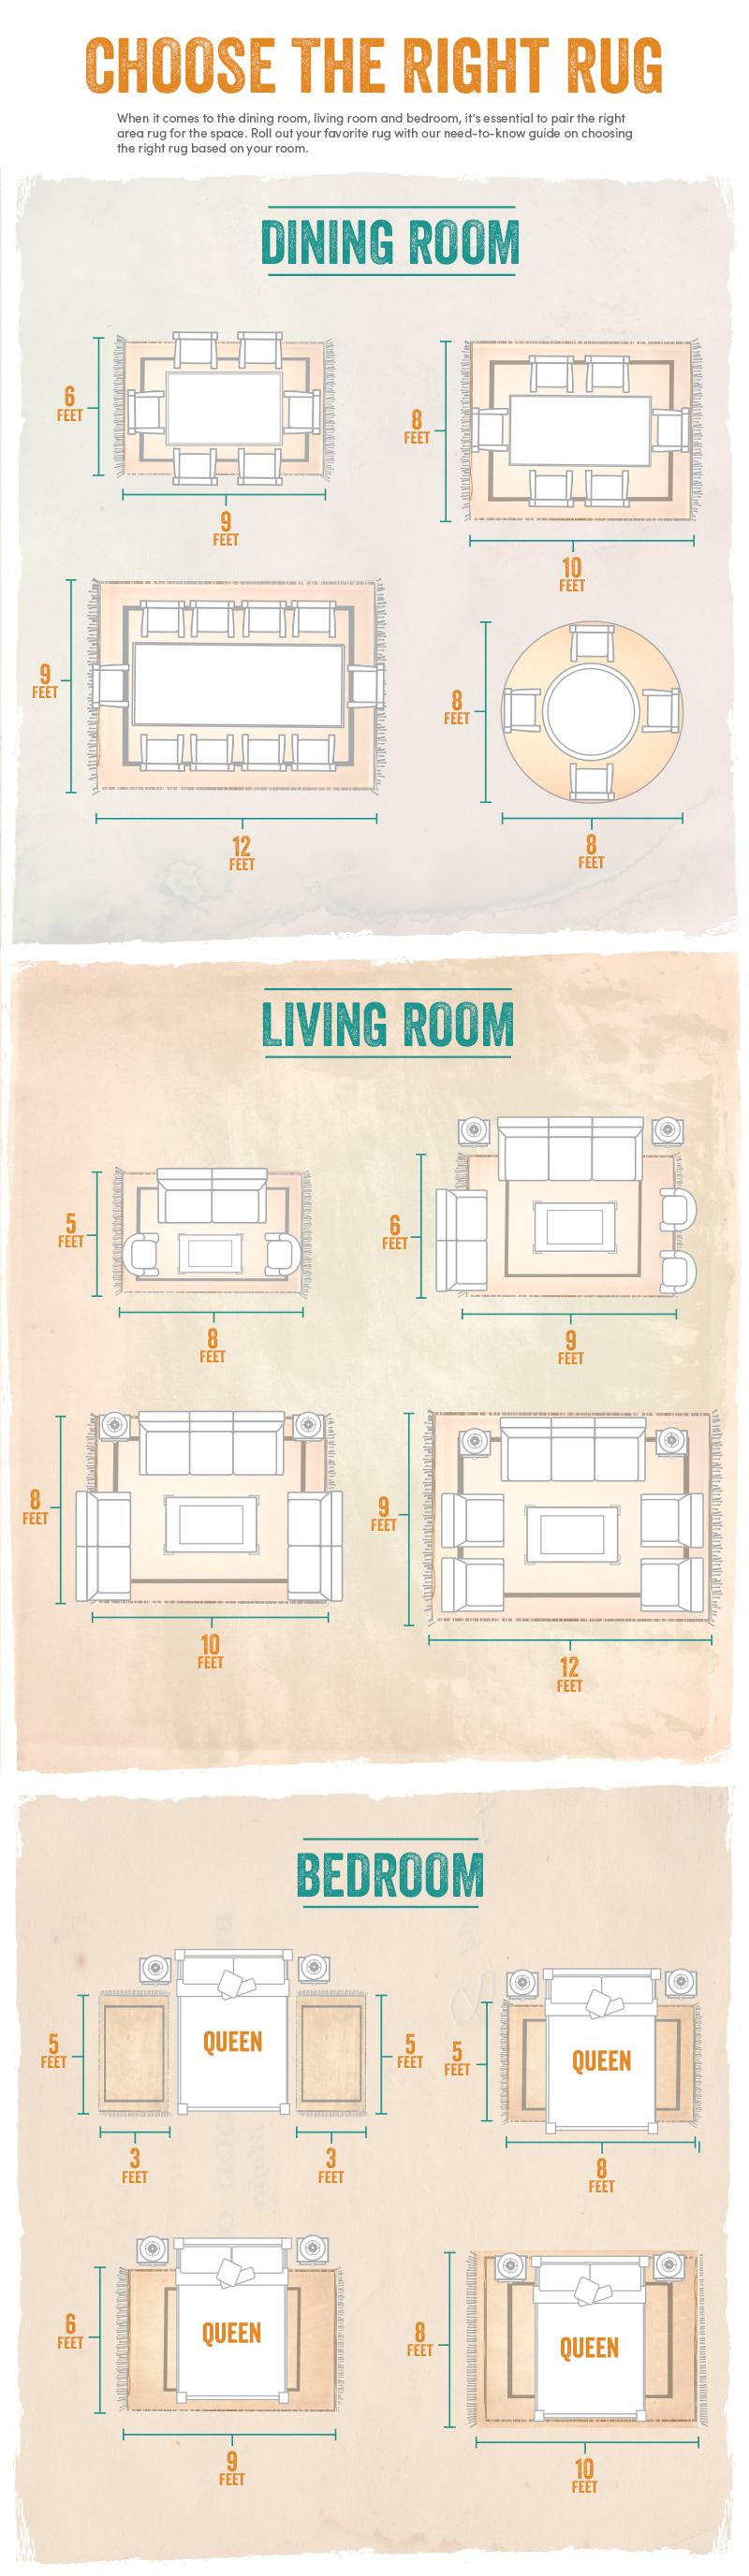 Area Rug Or Carpet